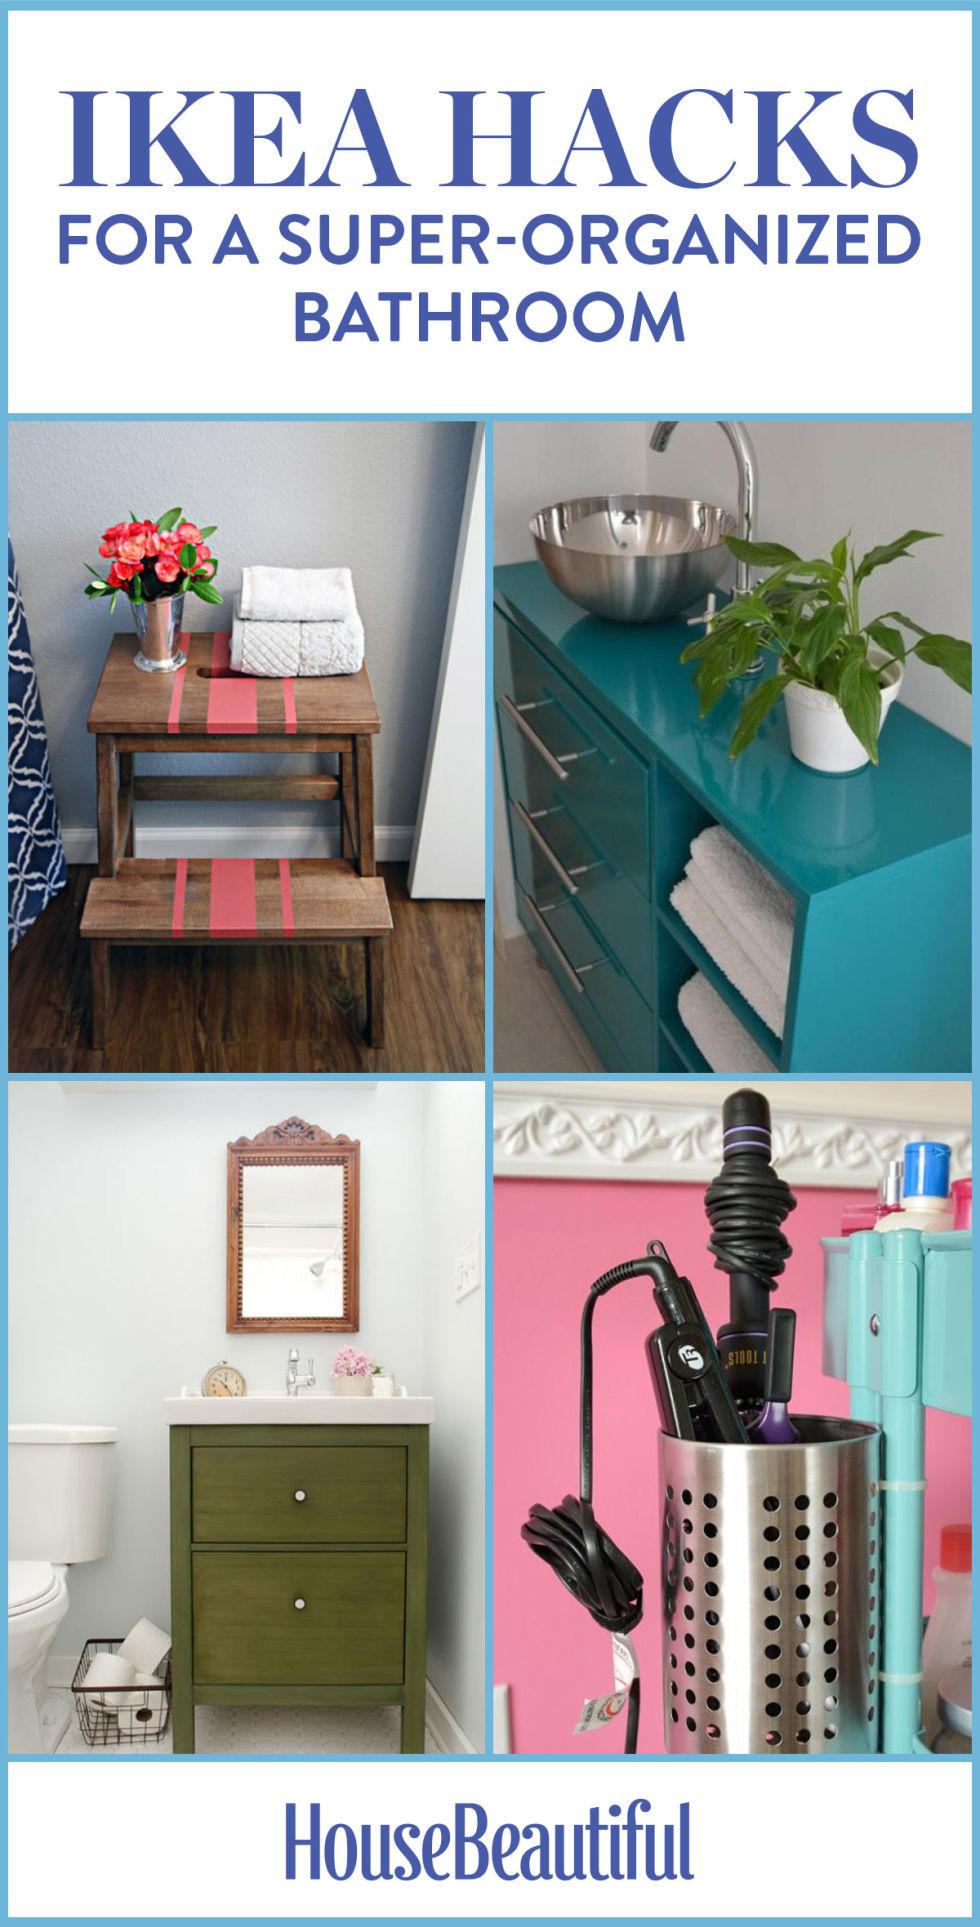 11 ikea bathroom hacks new uses for ikea items in the bathroom